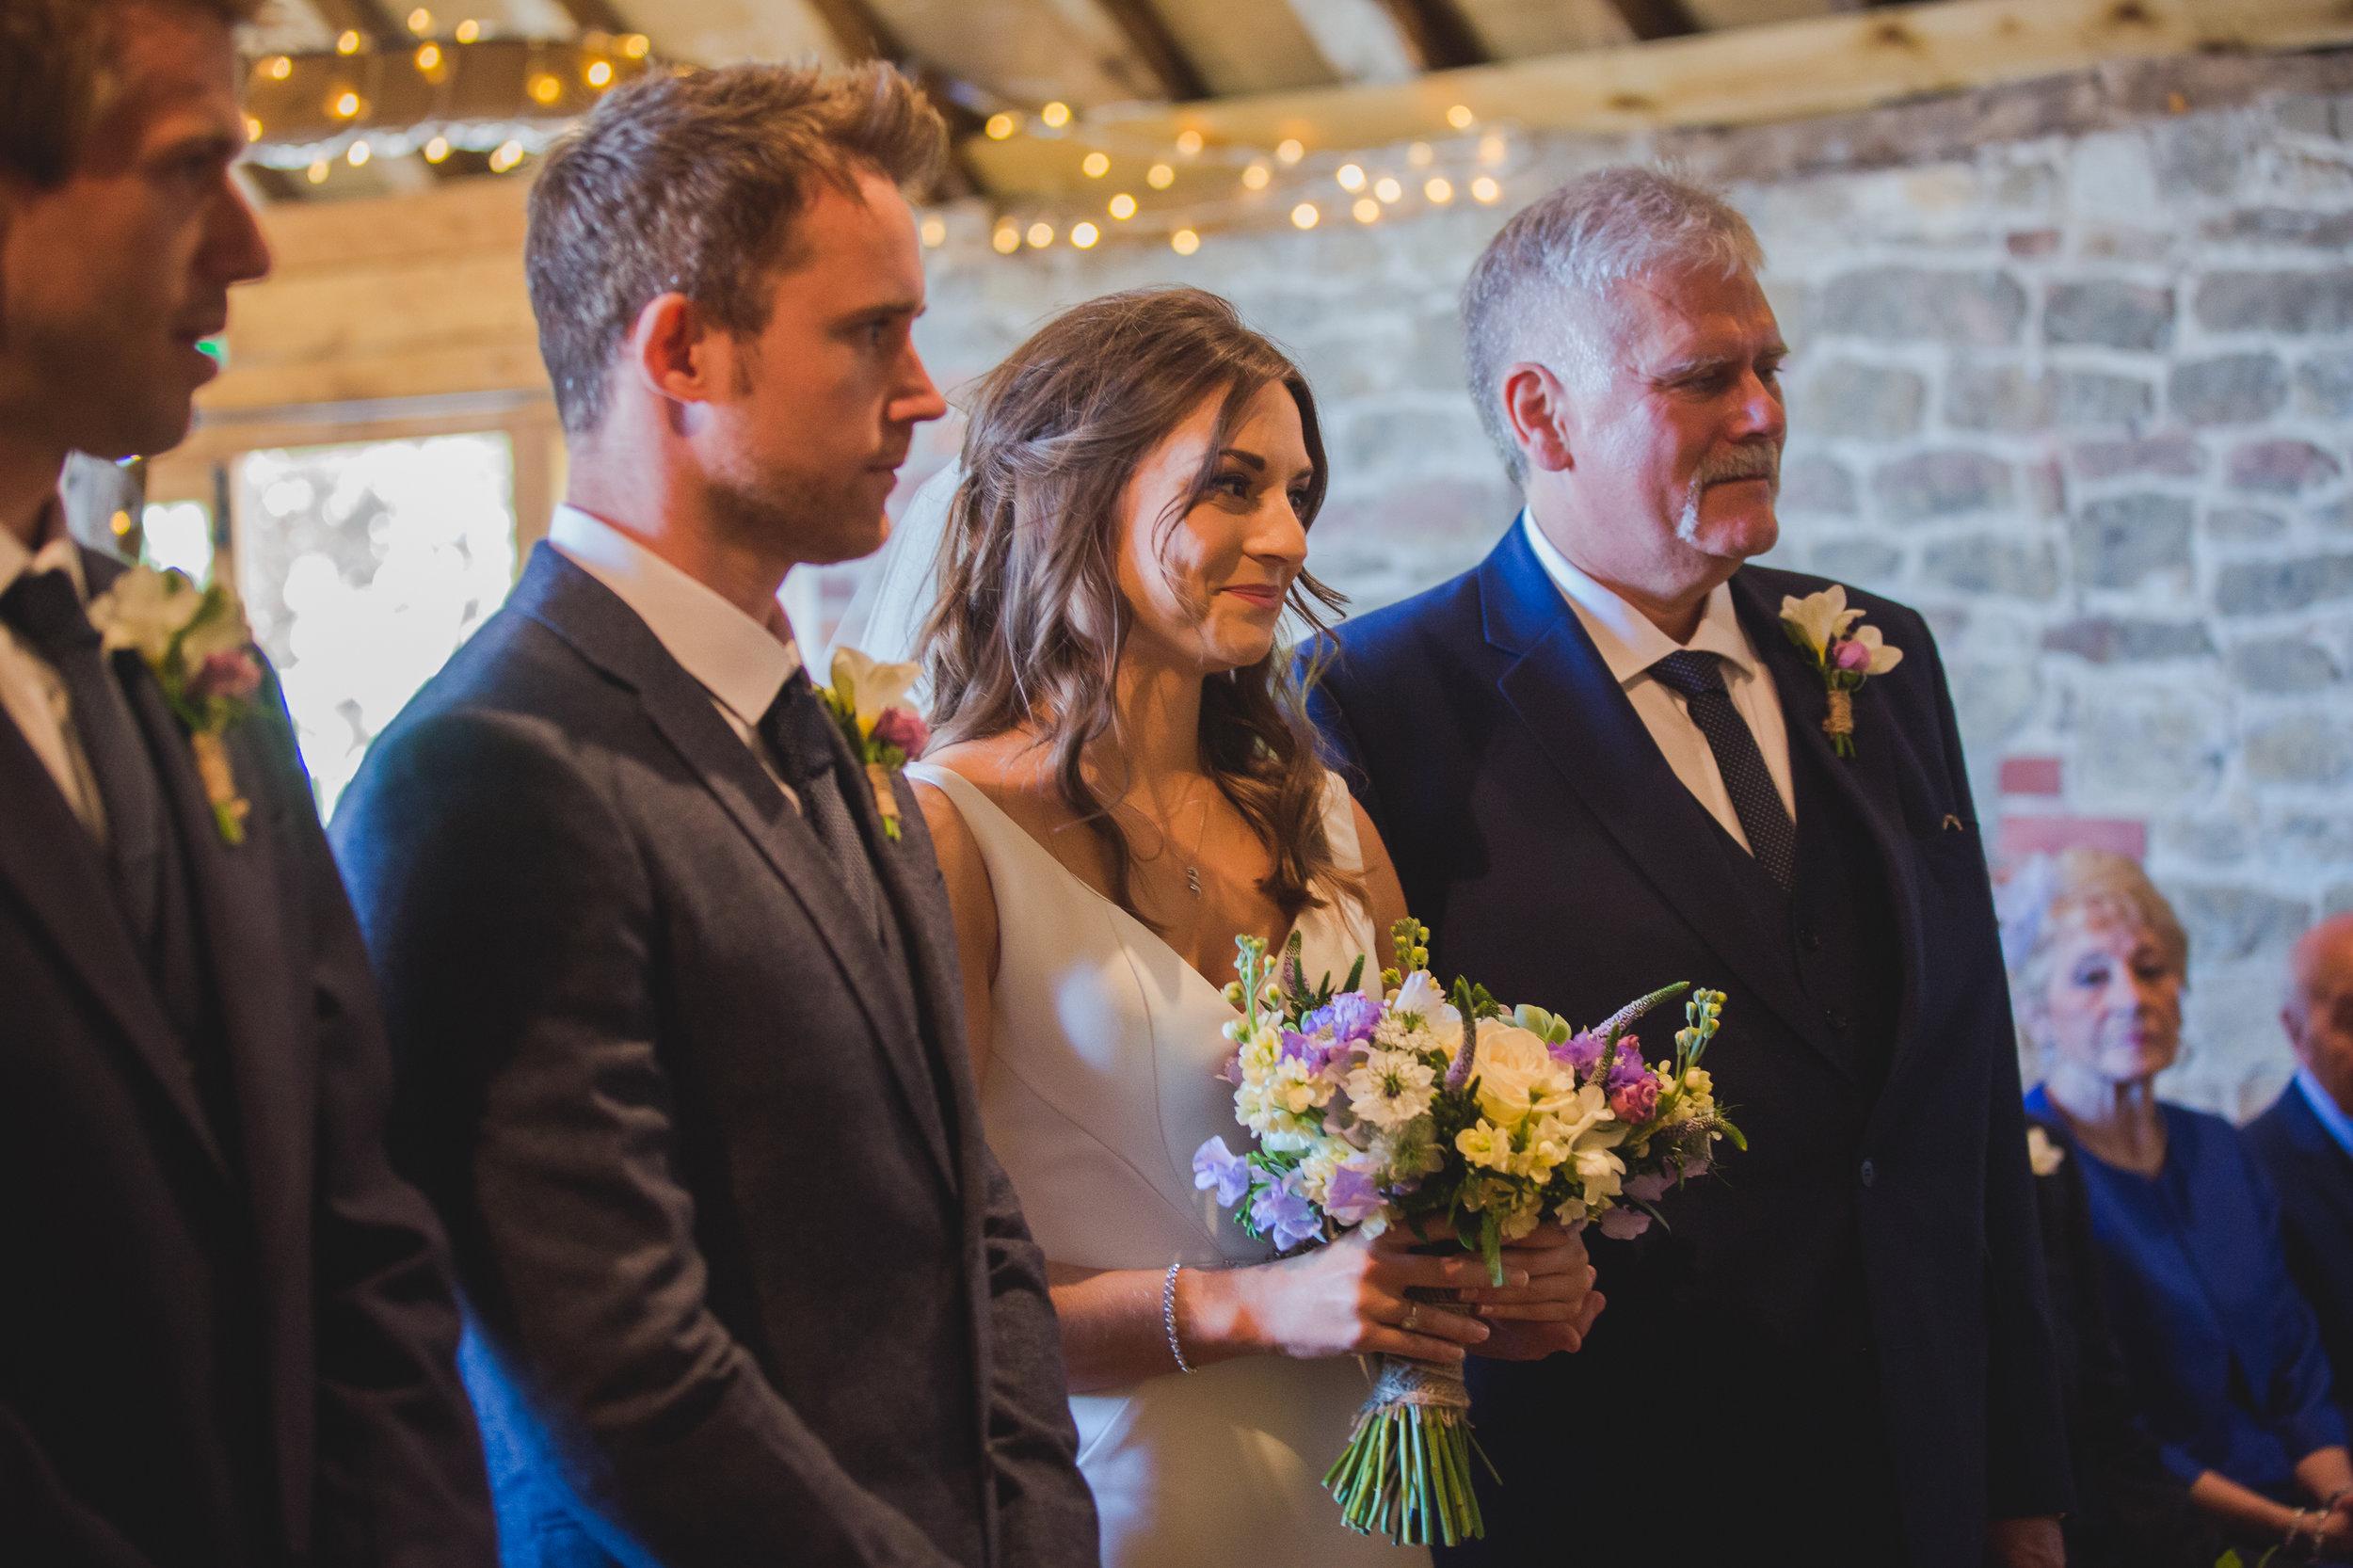 Grittenham Barn female wedding photographers west sussex petworth social-50.jpg